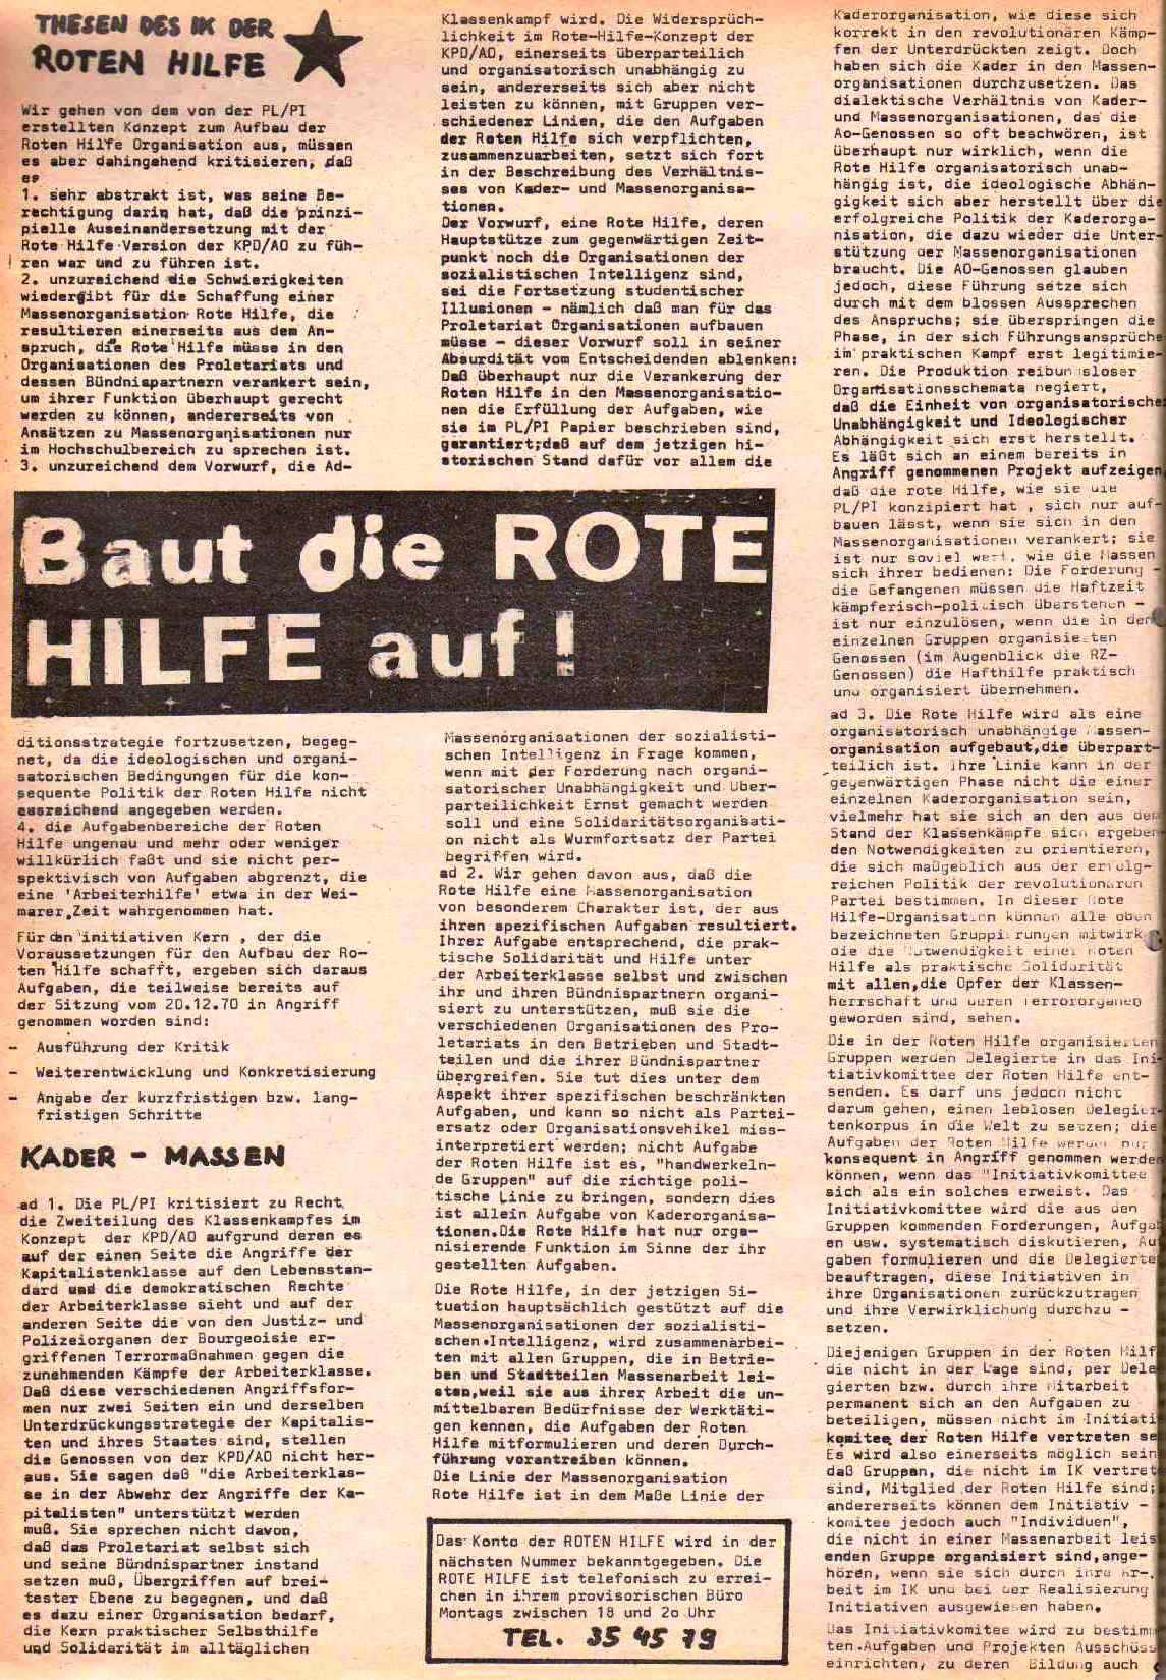 Berlin_Hochschulkampf_1971_01_08